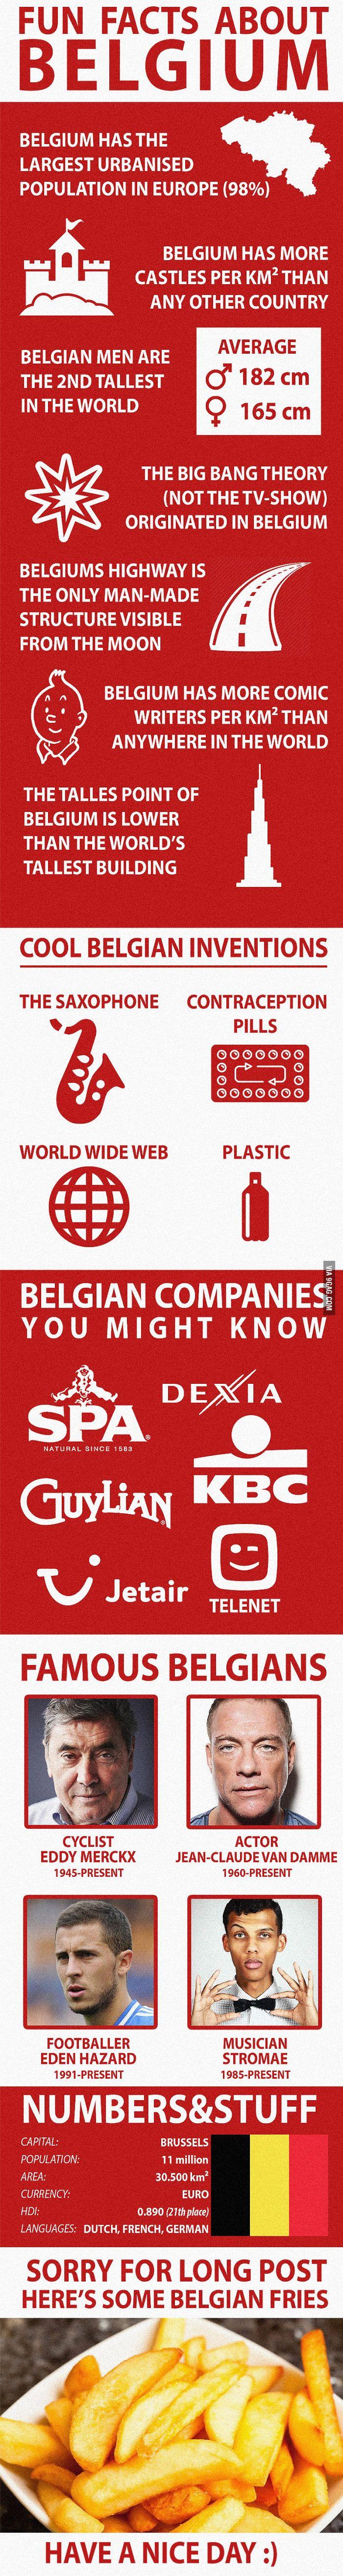 Fun Facts about Belgium